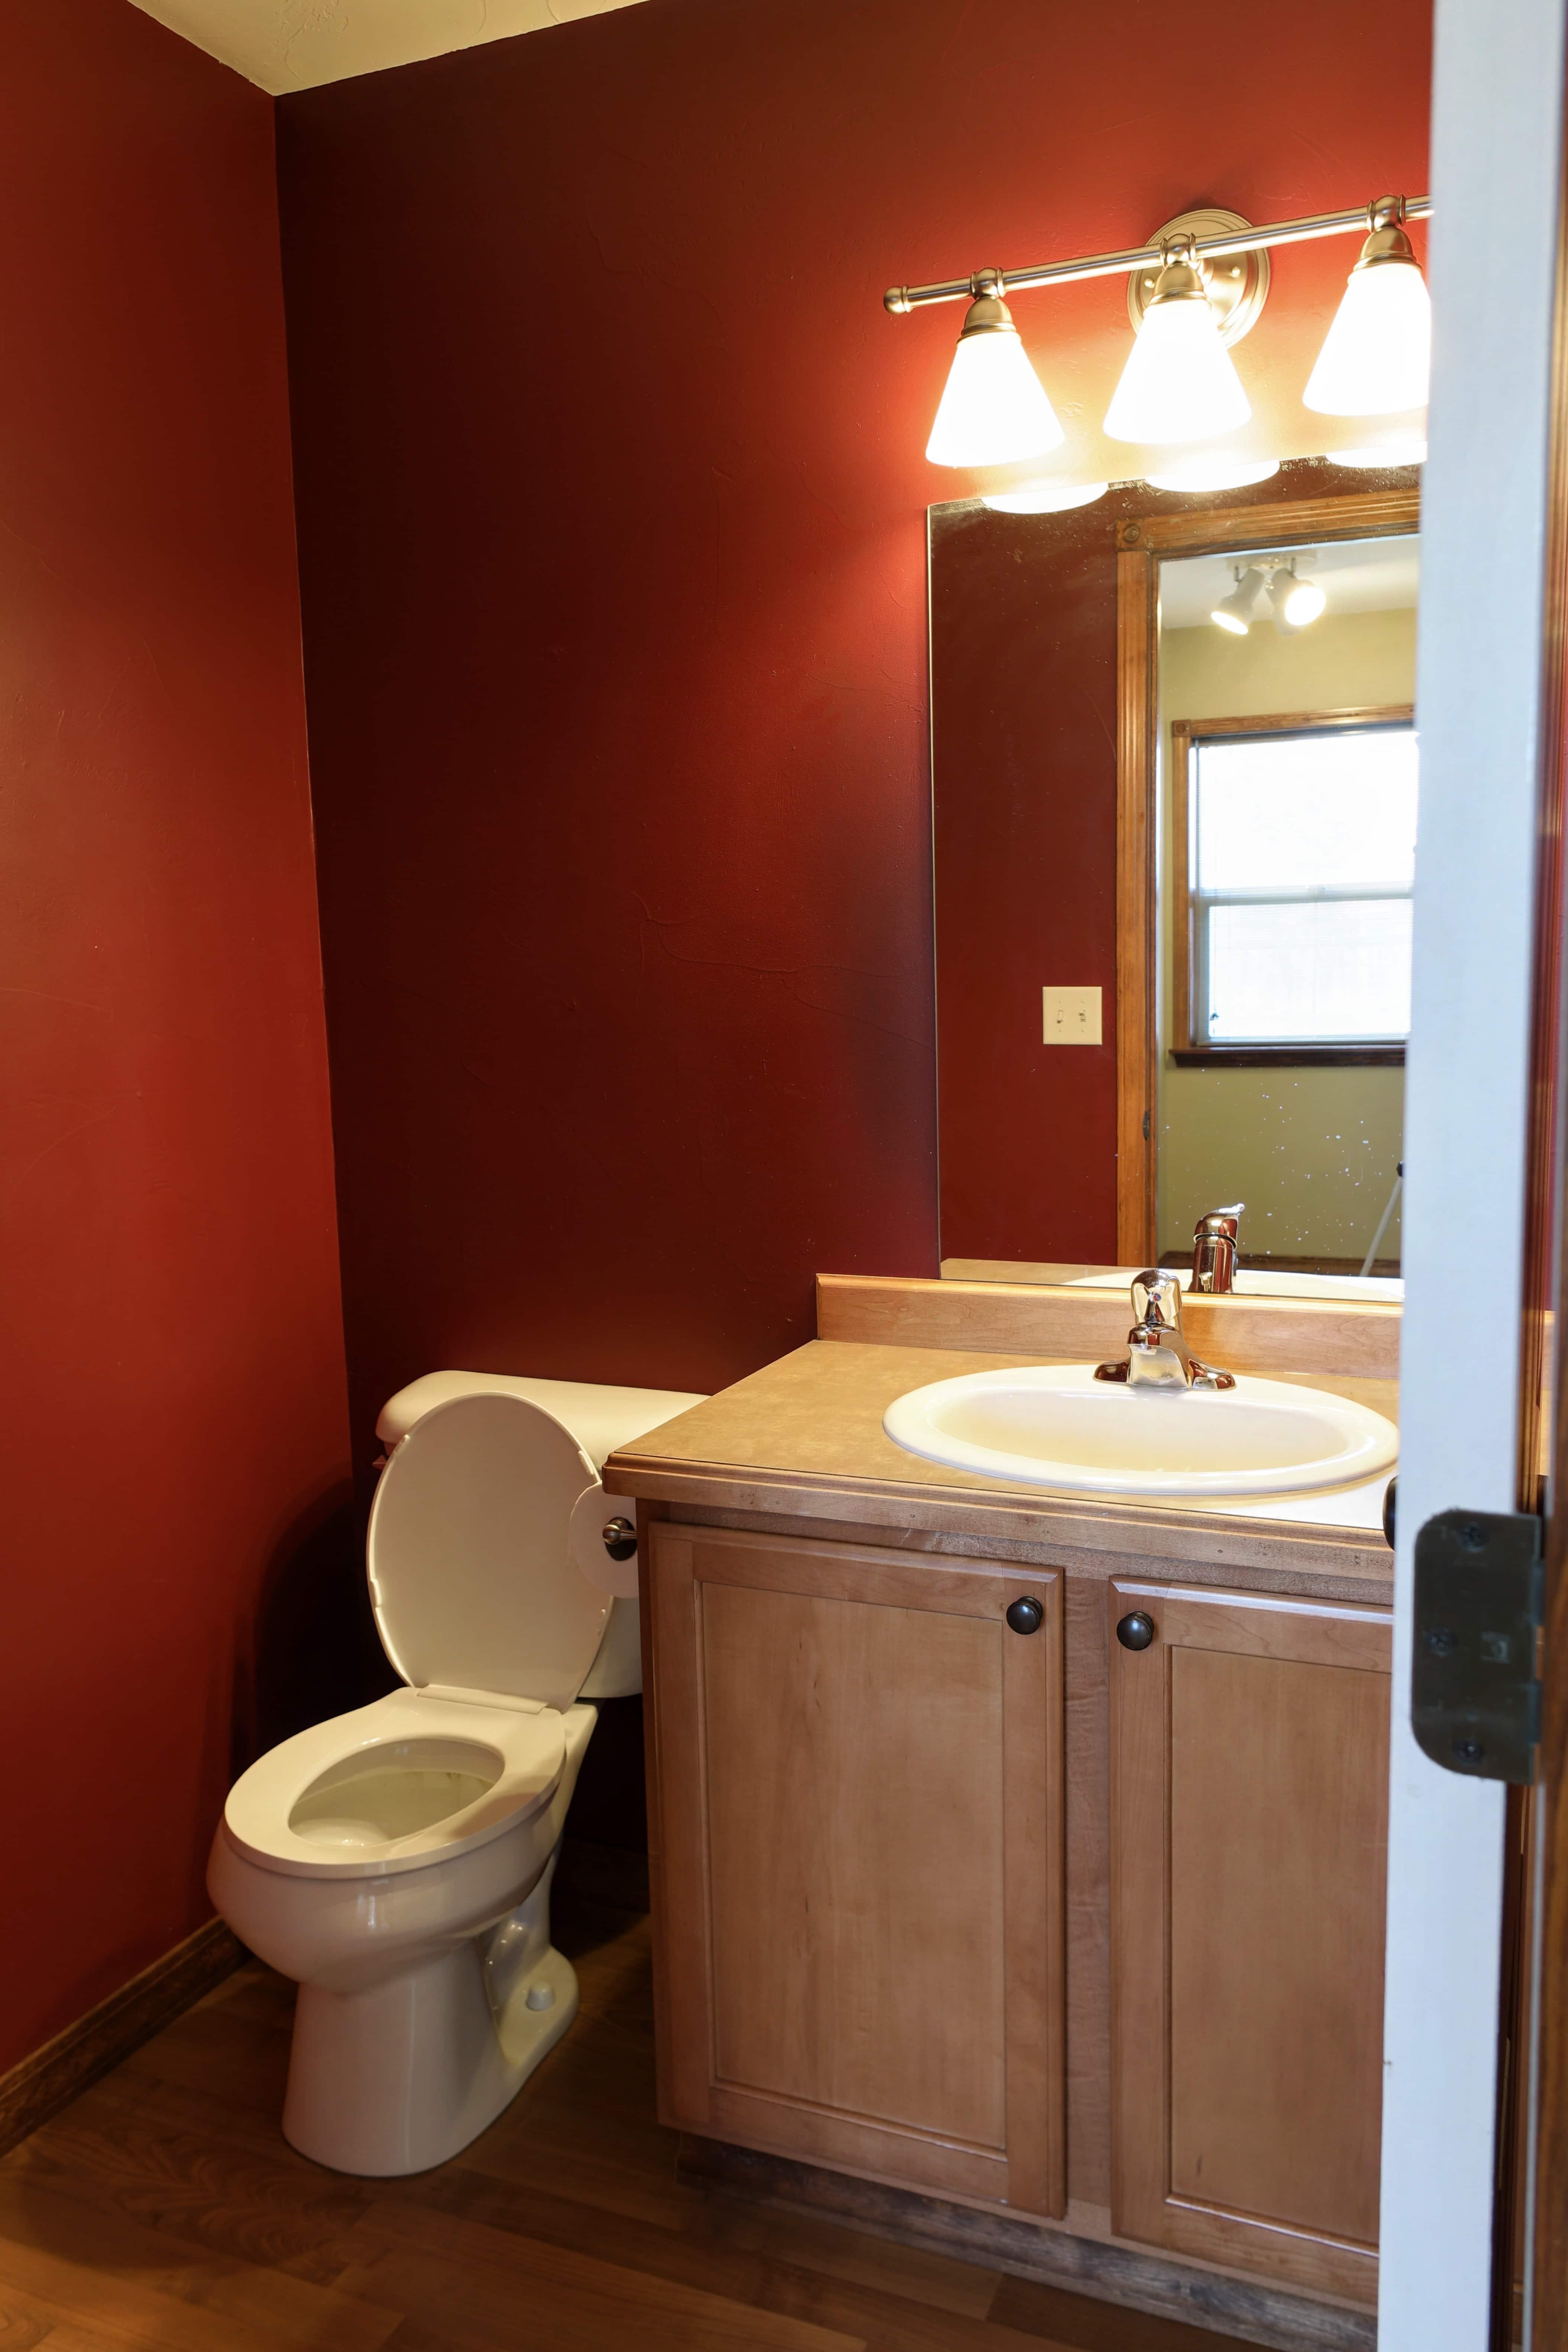 half bathroom with red walls and builder grade vanity